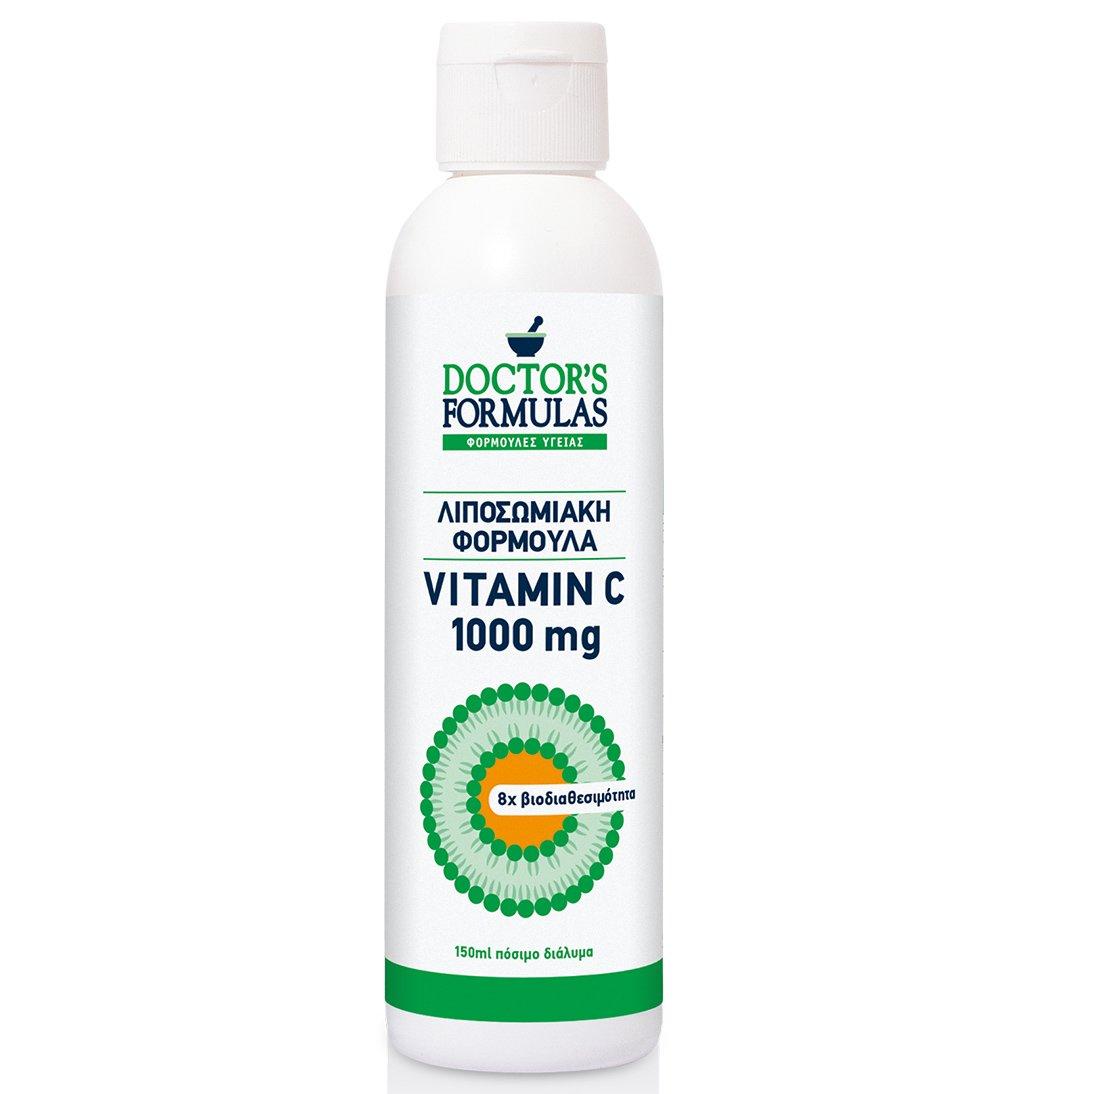 Doctor's Formulas Λιποσωμιακή Vitamin Φορμουλα Αντιοξείδωσης και Ανοσοποιητικού C 1000 mg 150 ml